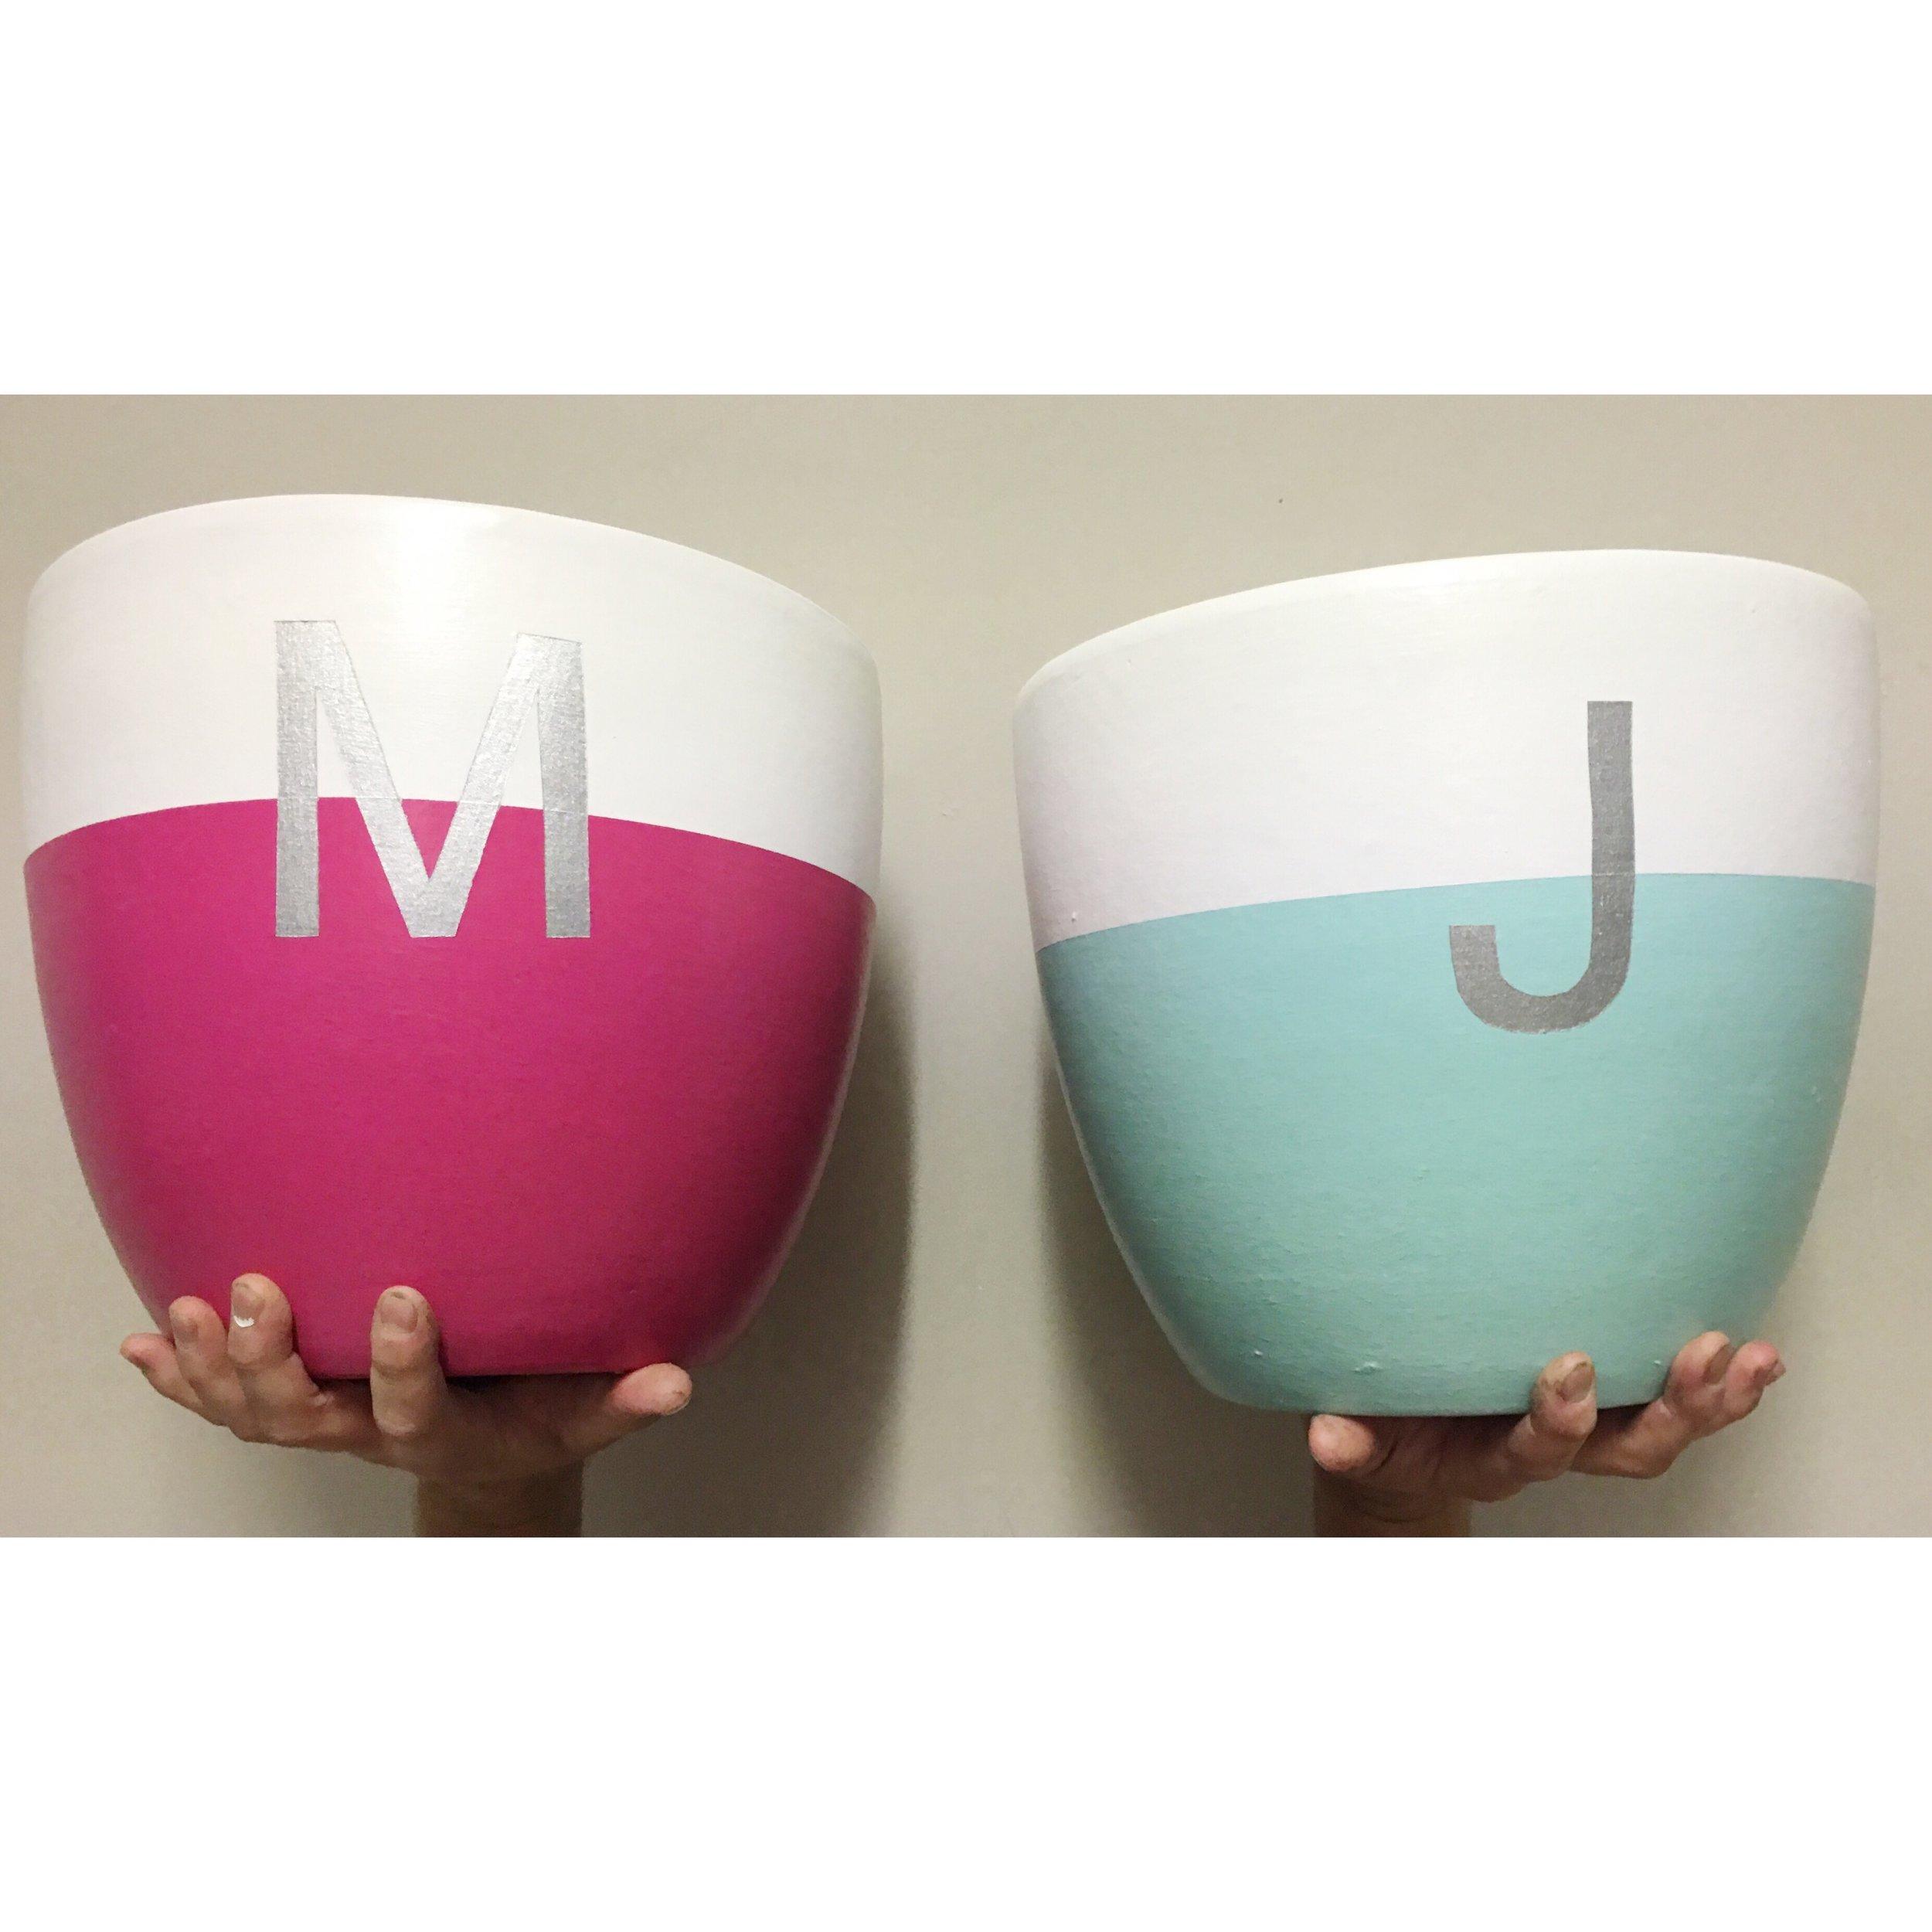 Initial pots.jpg